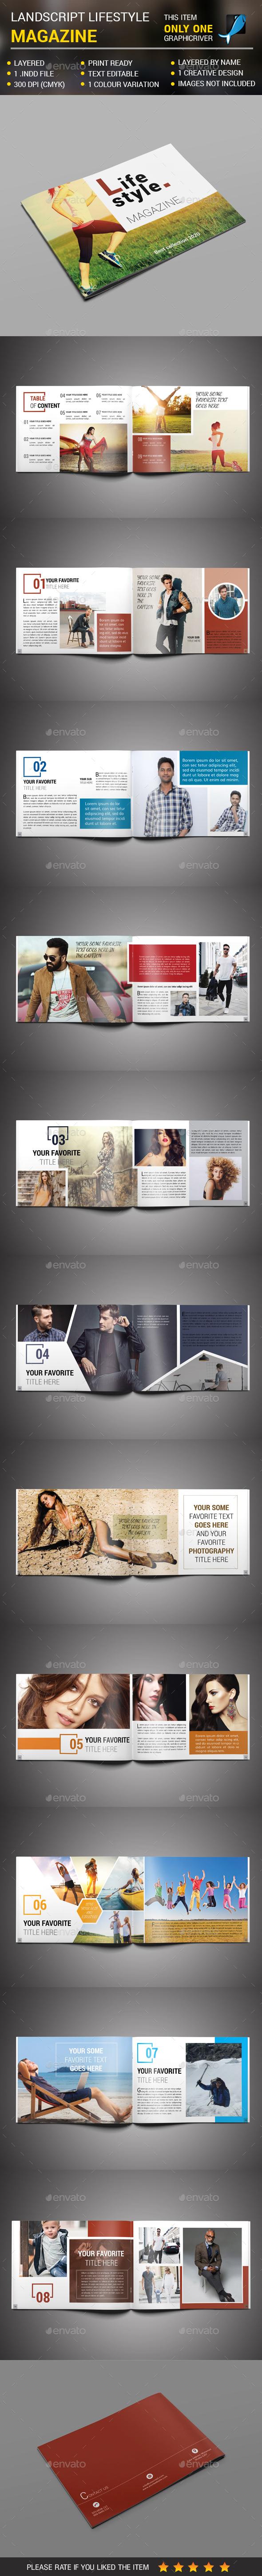 GraphicRiver Landscript Lifestyle Magazine 21163654